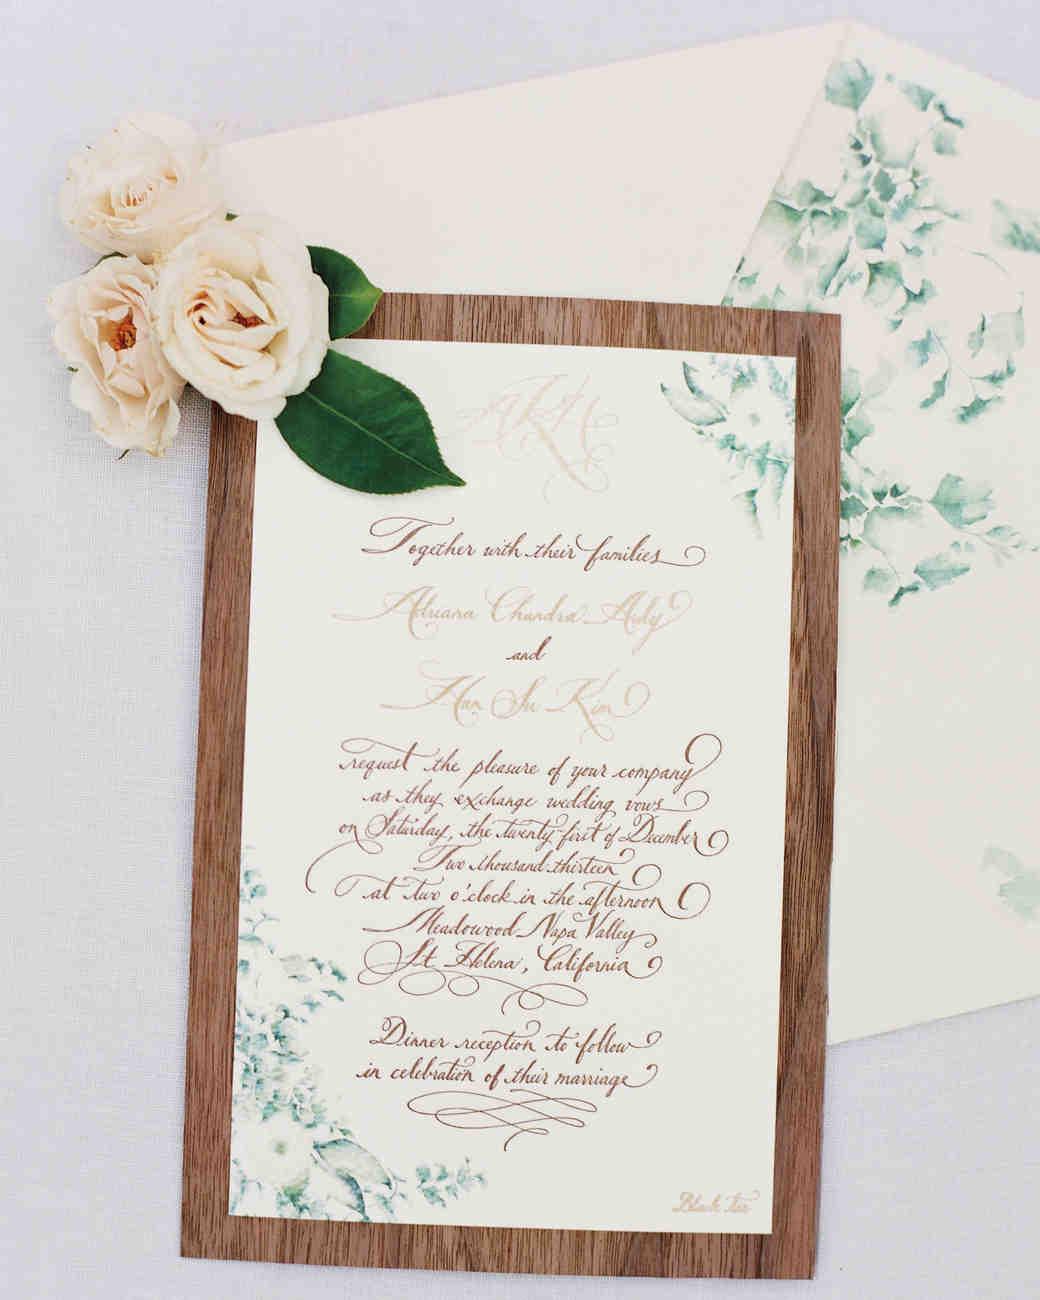 adriana-han-wedding-57570012-s111814.jpg